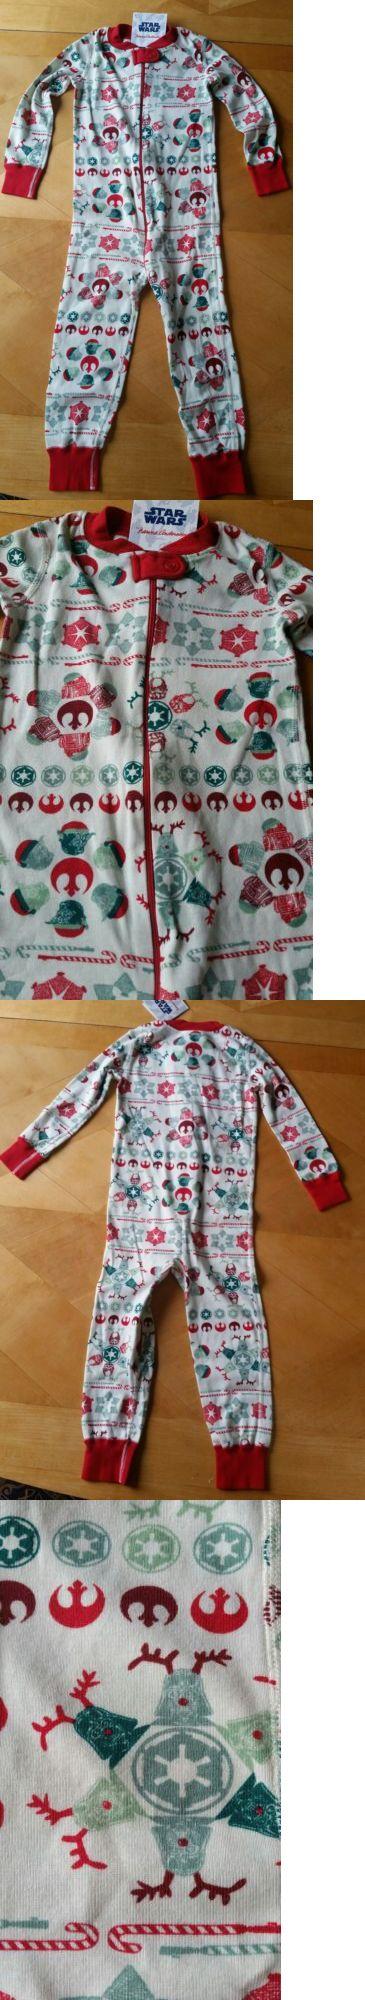 Sleepwear 147336: Nwt Hanna Andersson Star Wars Holiday Snowflake Zipper Sleeper Pajamas 90 3T 3 -> BUY IT NOW ONLY: $39 on eBay!